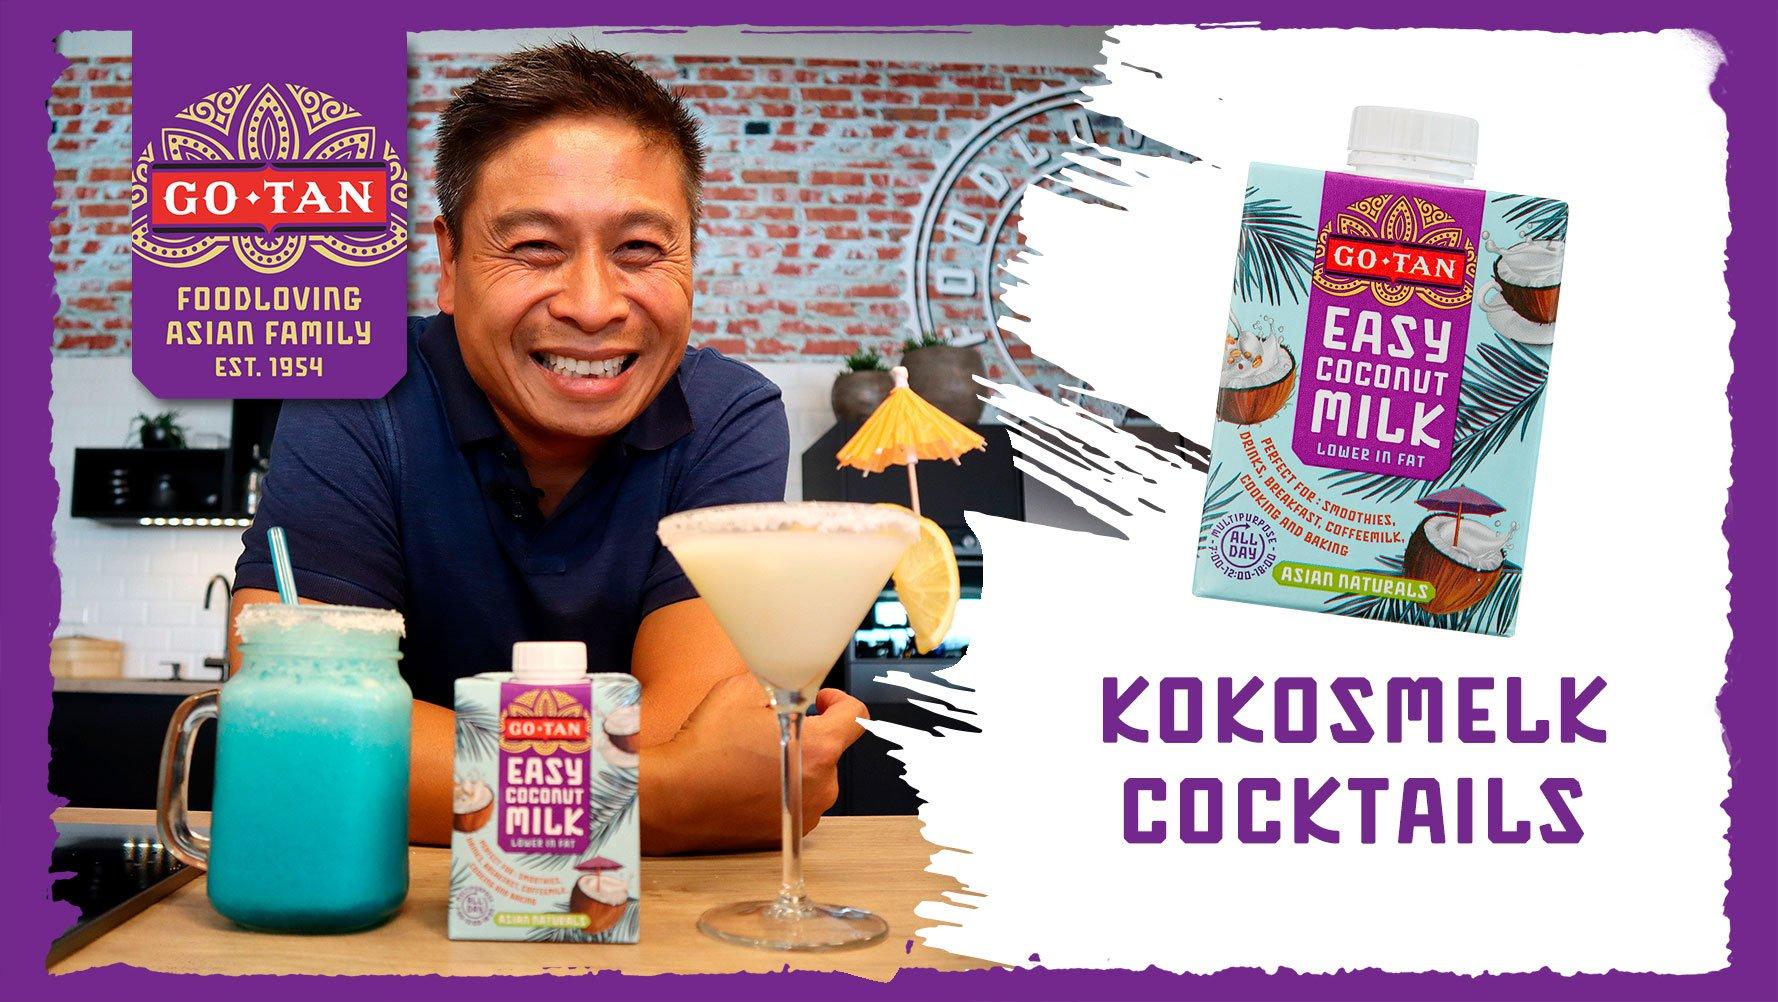 Miniatuur_YT17_Cocktails-met-Easy-Coconut-Milk_V1b.jpg